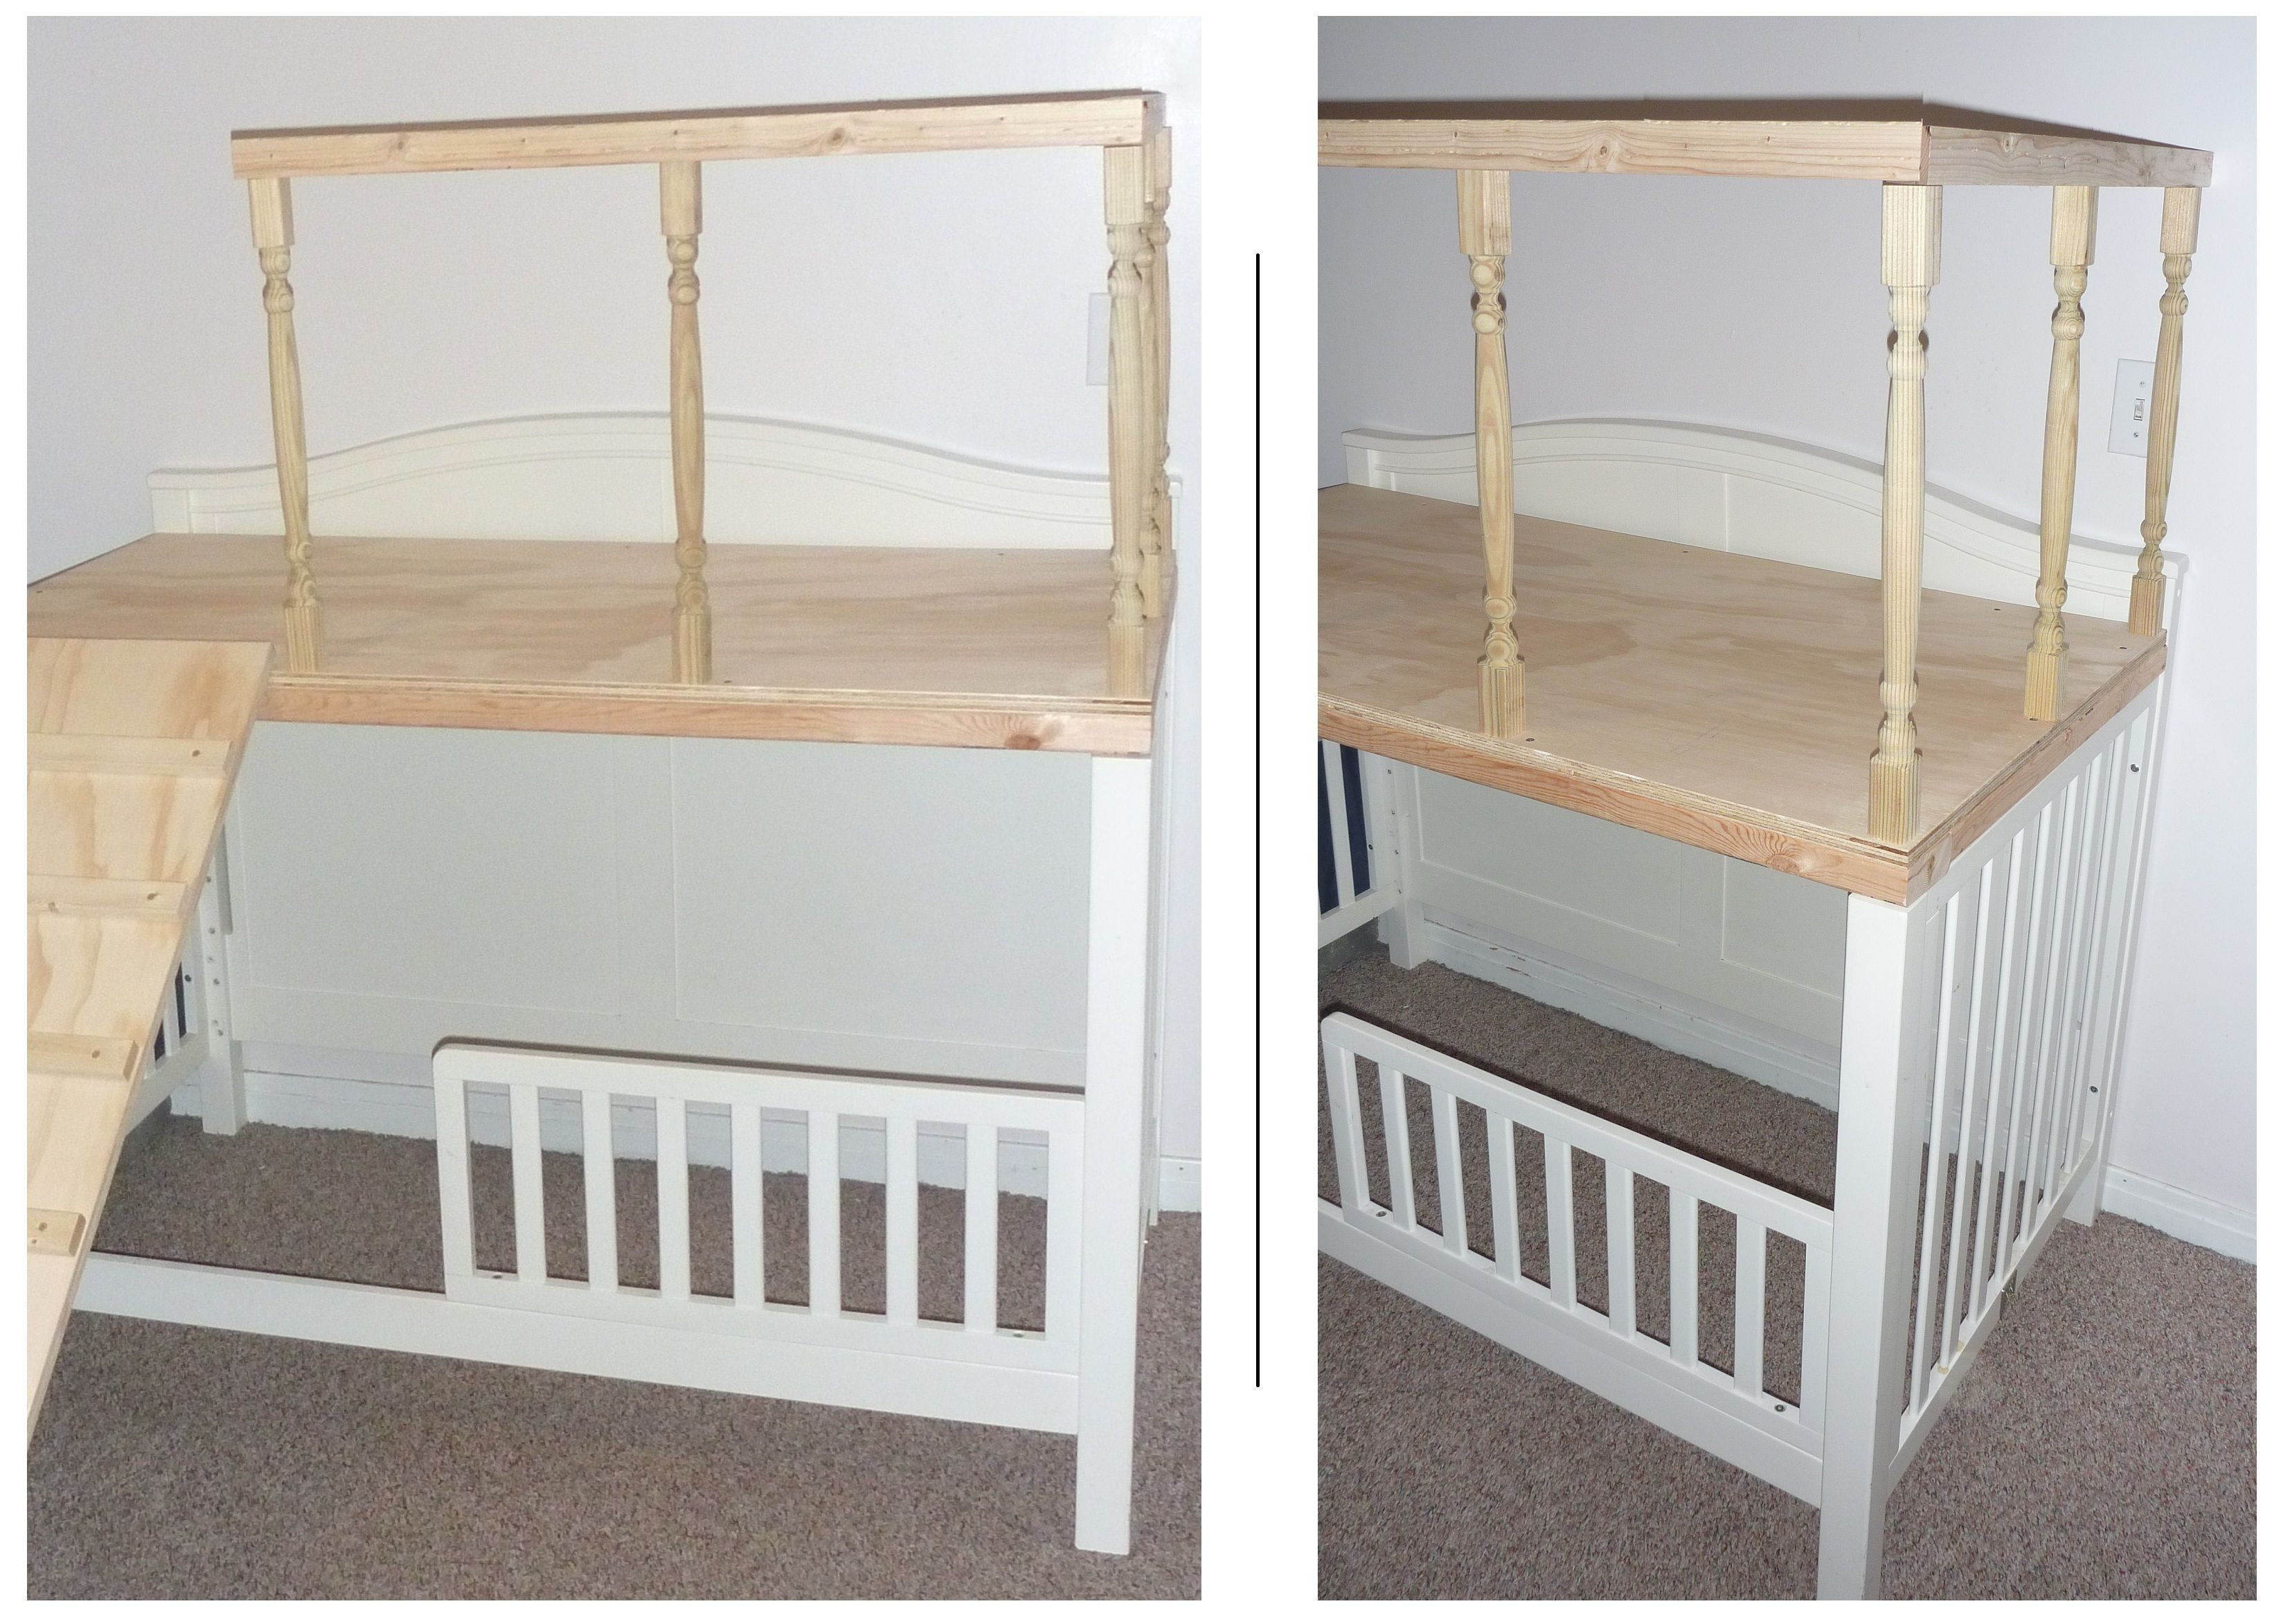 143 best Children\u0027s Bed / Bedroom Ideas images on Pinterest ...